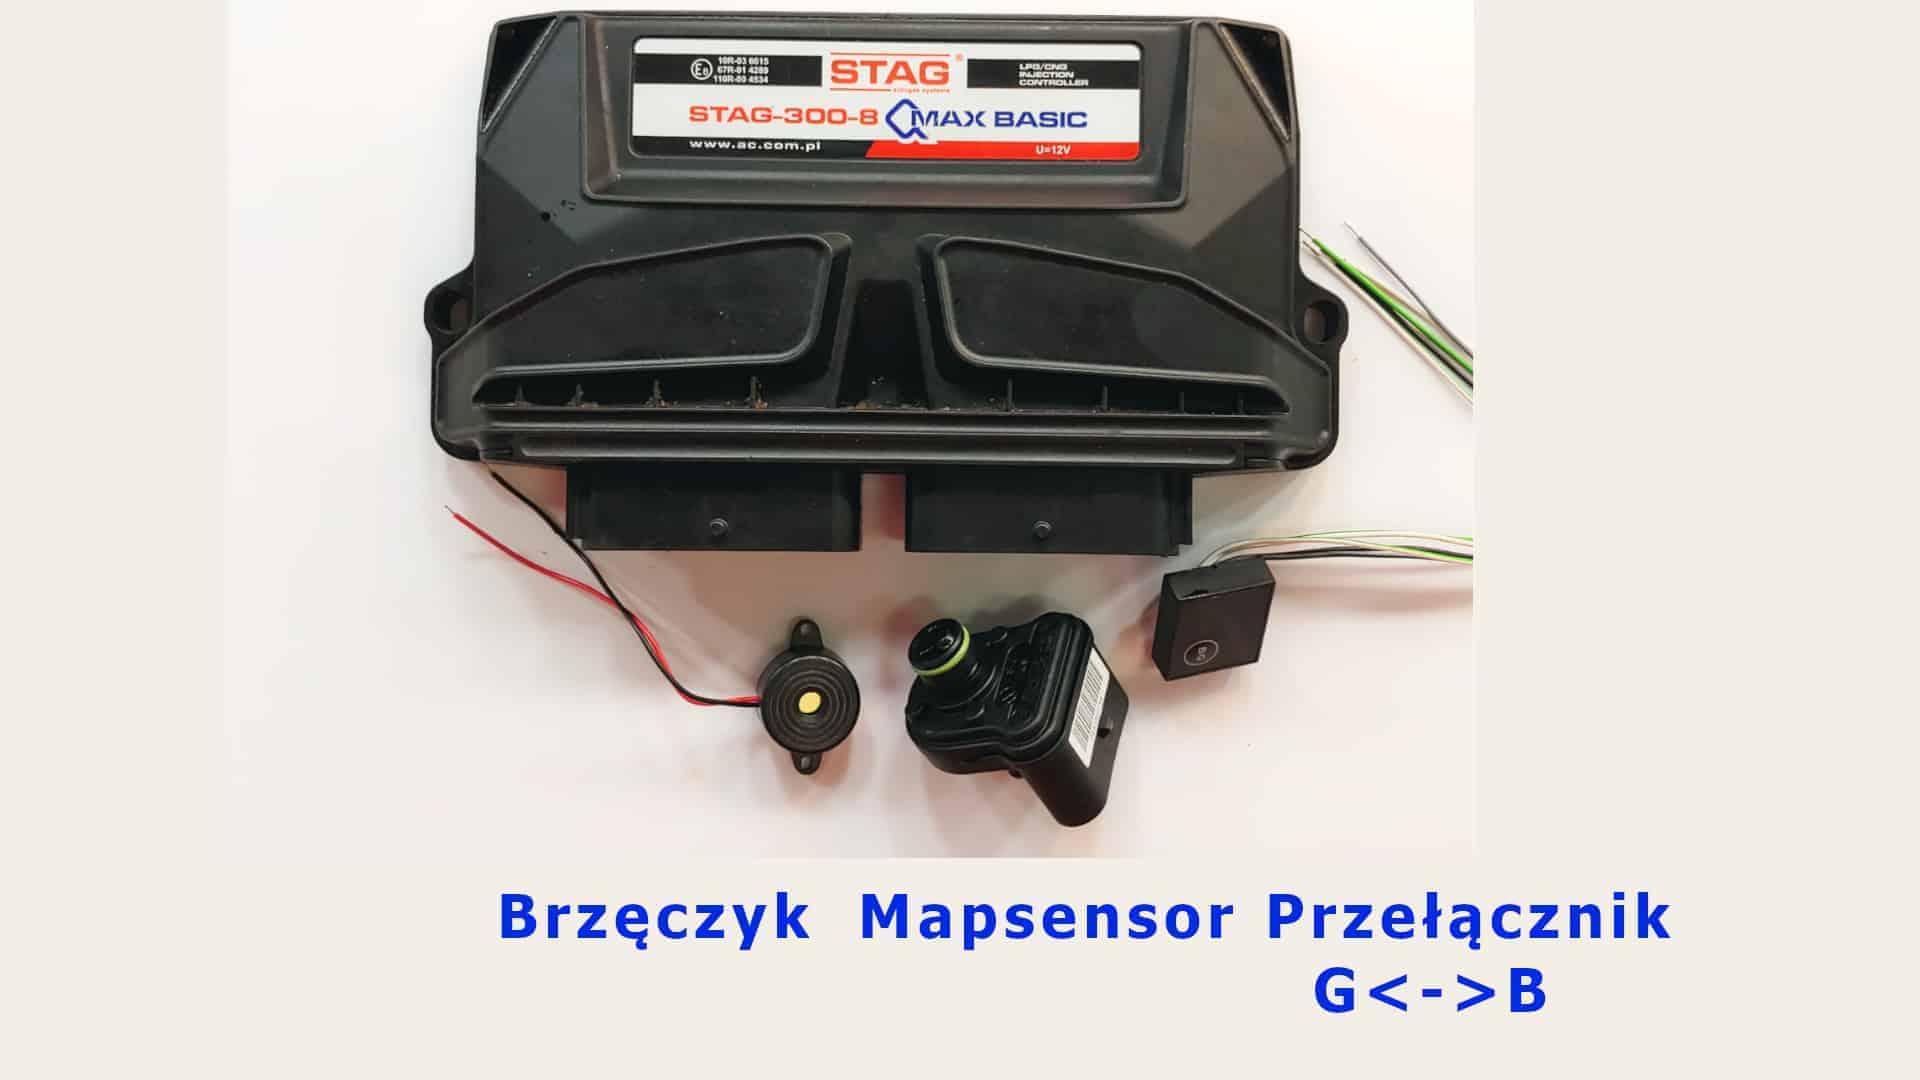 Sterownik Stag Qmax Basic zestaw